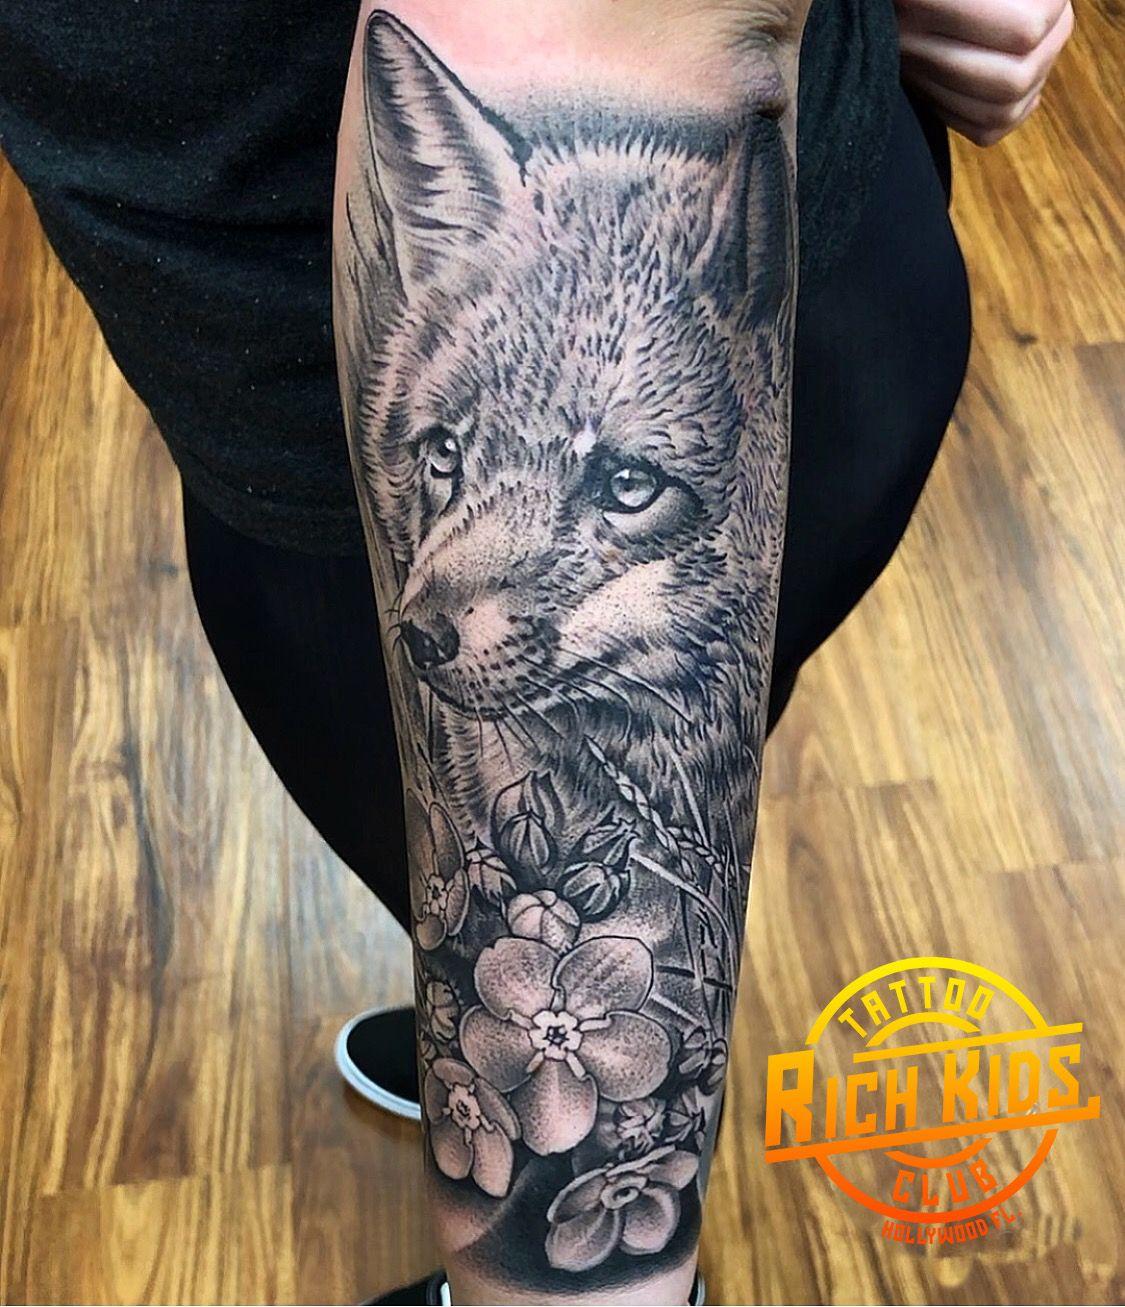 Half Sleeve Realistic Fox Tattoo Single Needle Technique Foxtattoo Fox Realisticfox Realisticfoxtattoo In 2020 Fox Tattoo Black And Grey Tattoos Tattoos For Kids